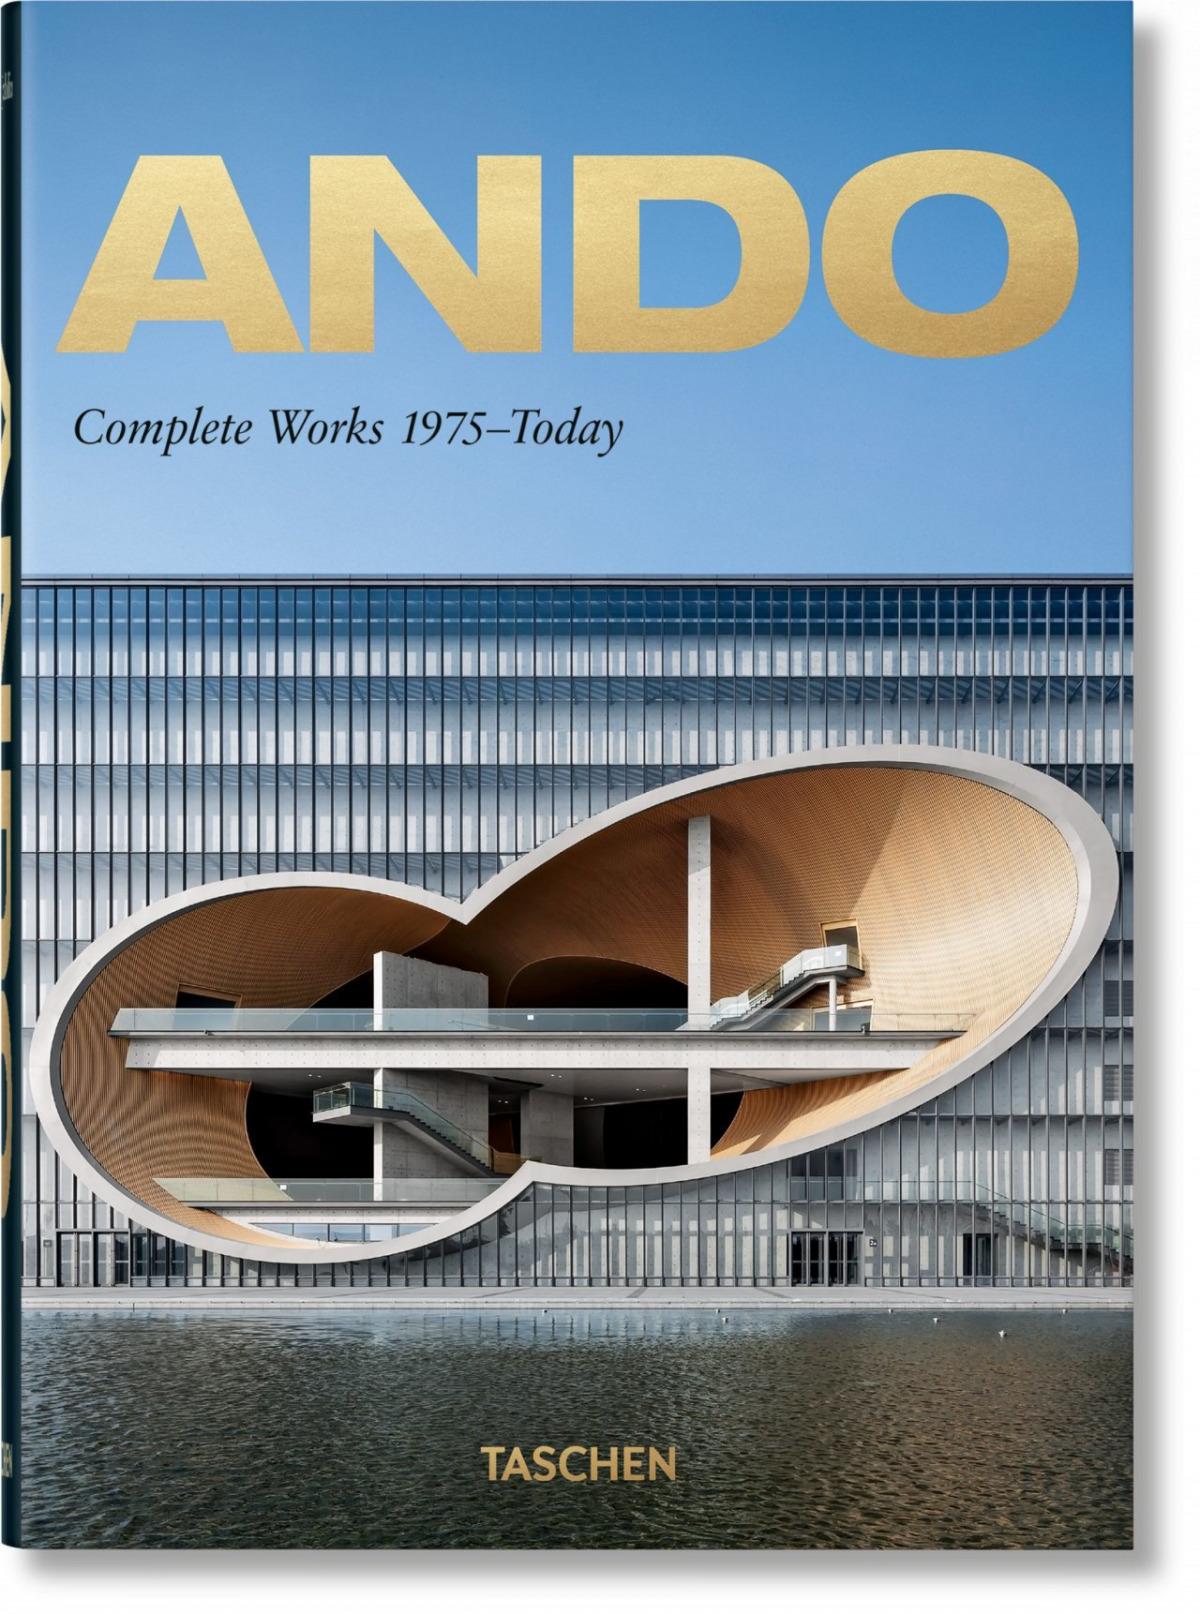 (ita).ando.complete works 1975-today.(40 aniversario)